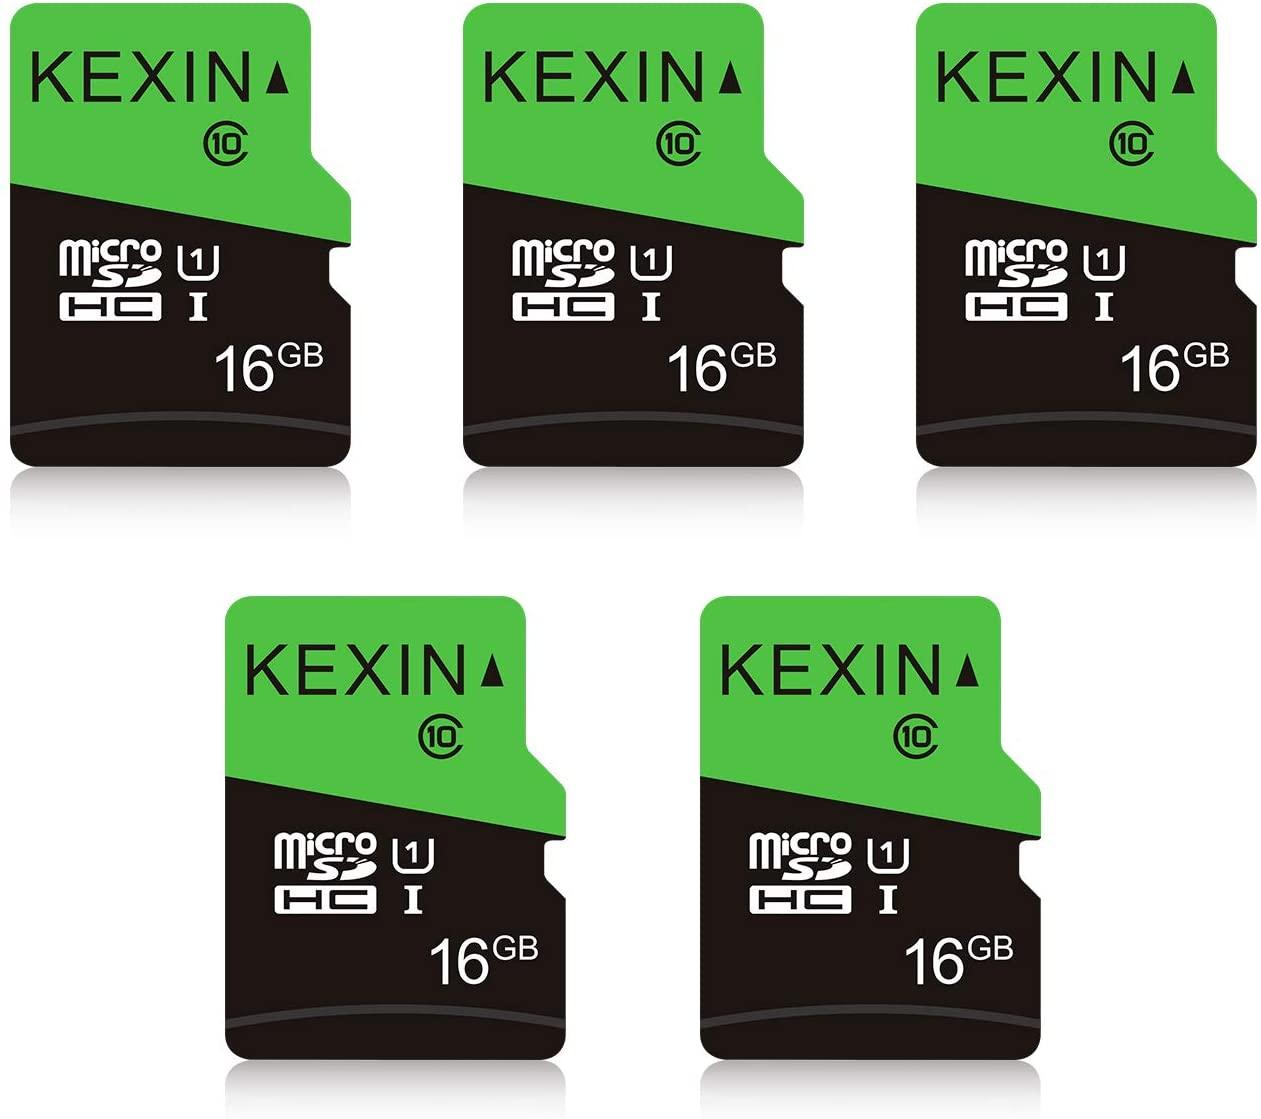 KEXIN Micro SD Card 16 GB 5 Pack MicroSDHC UHS-I Memory Card Class 10 High Speed Micro SD Card, C10, U1